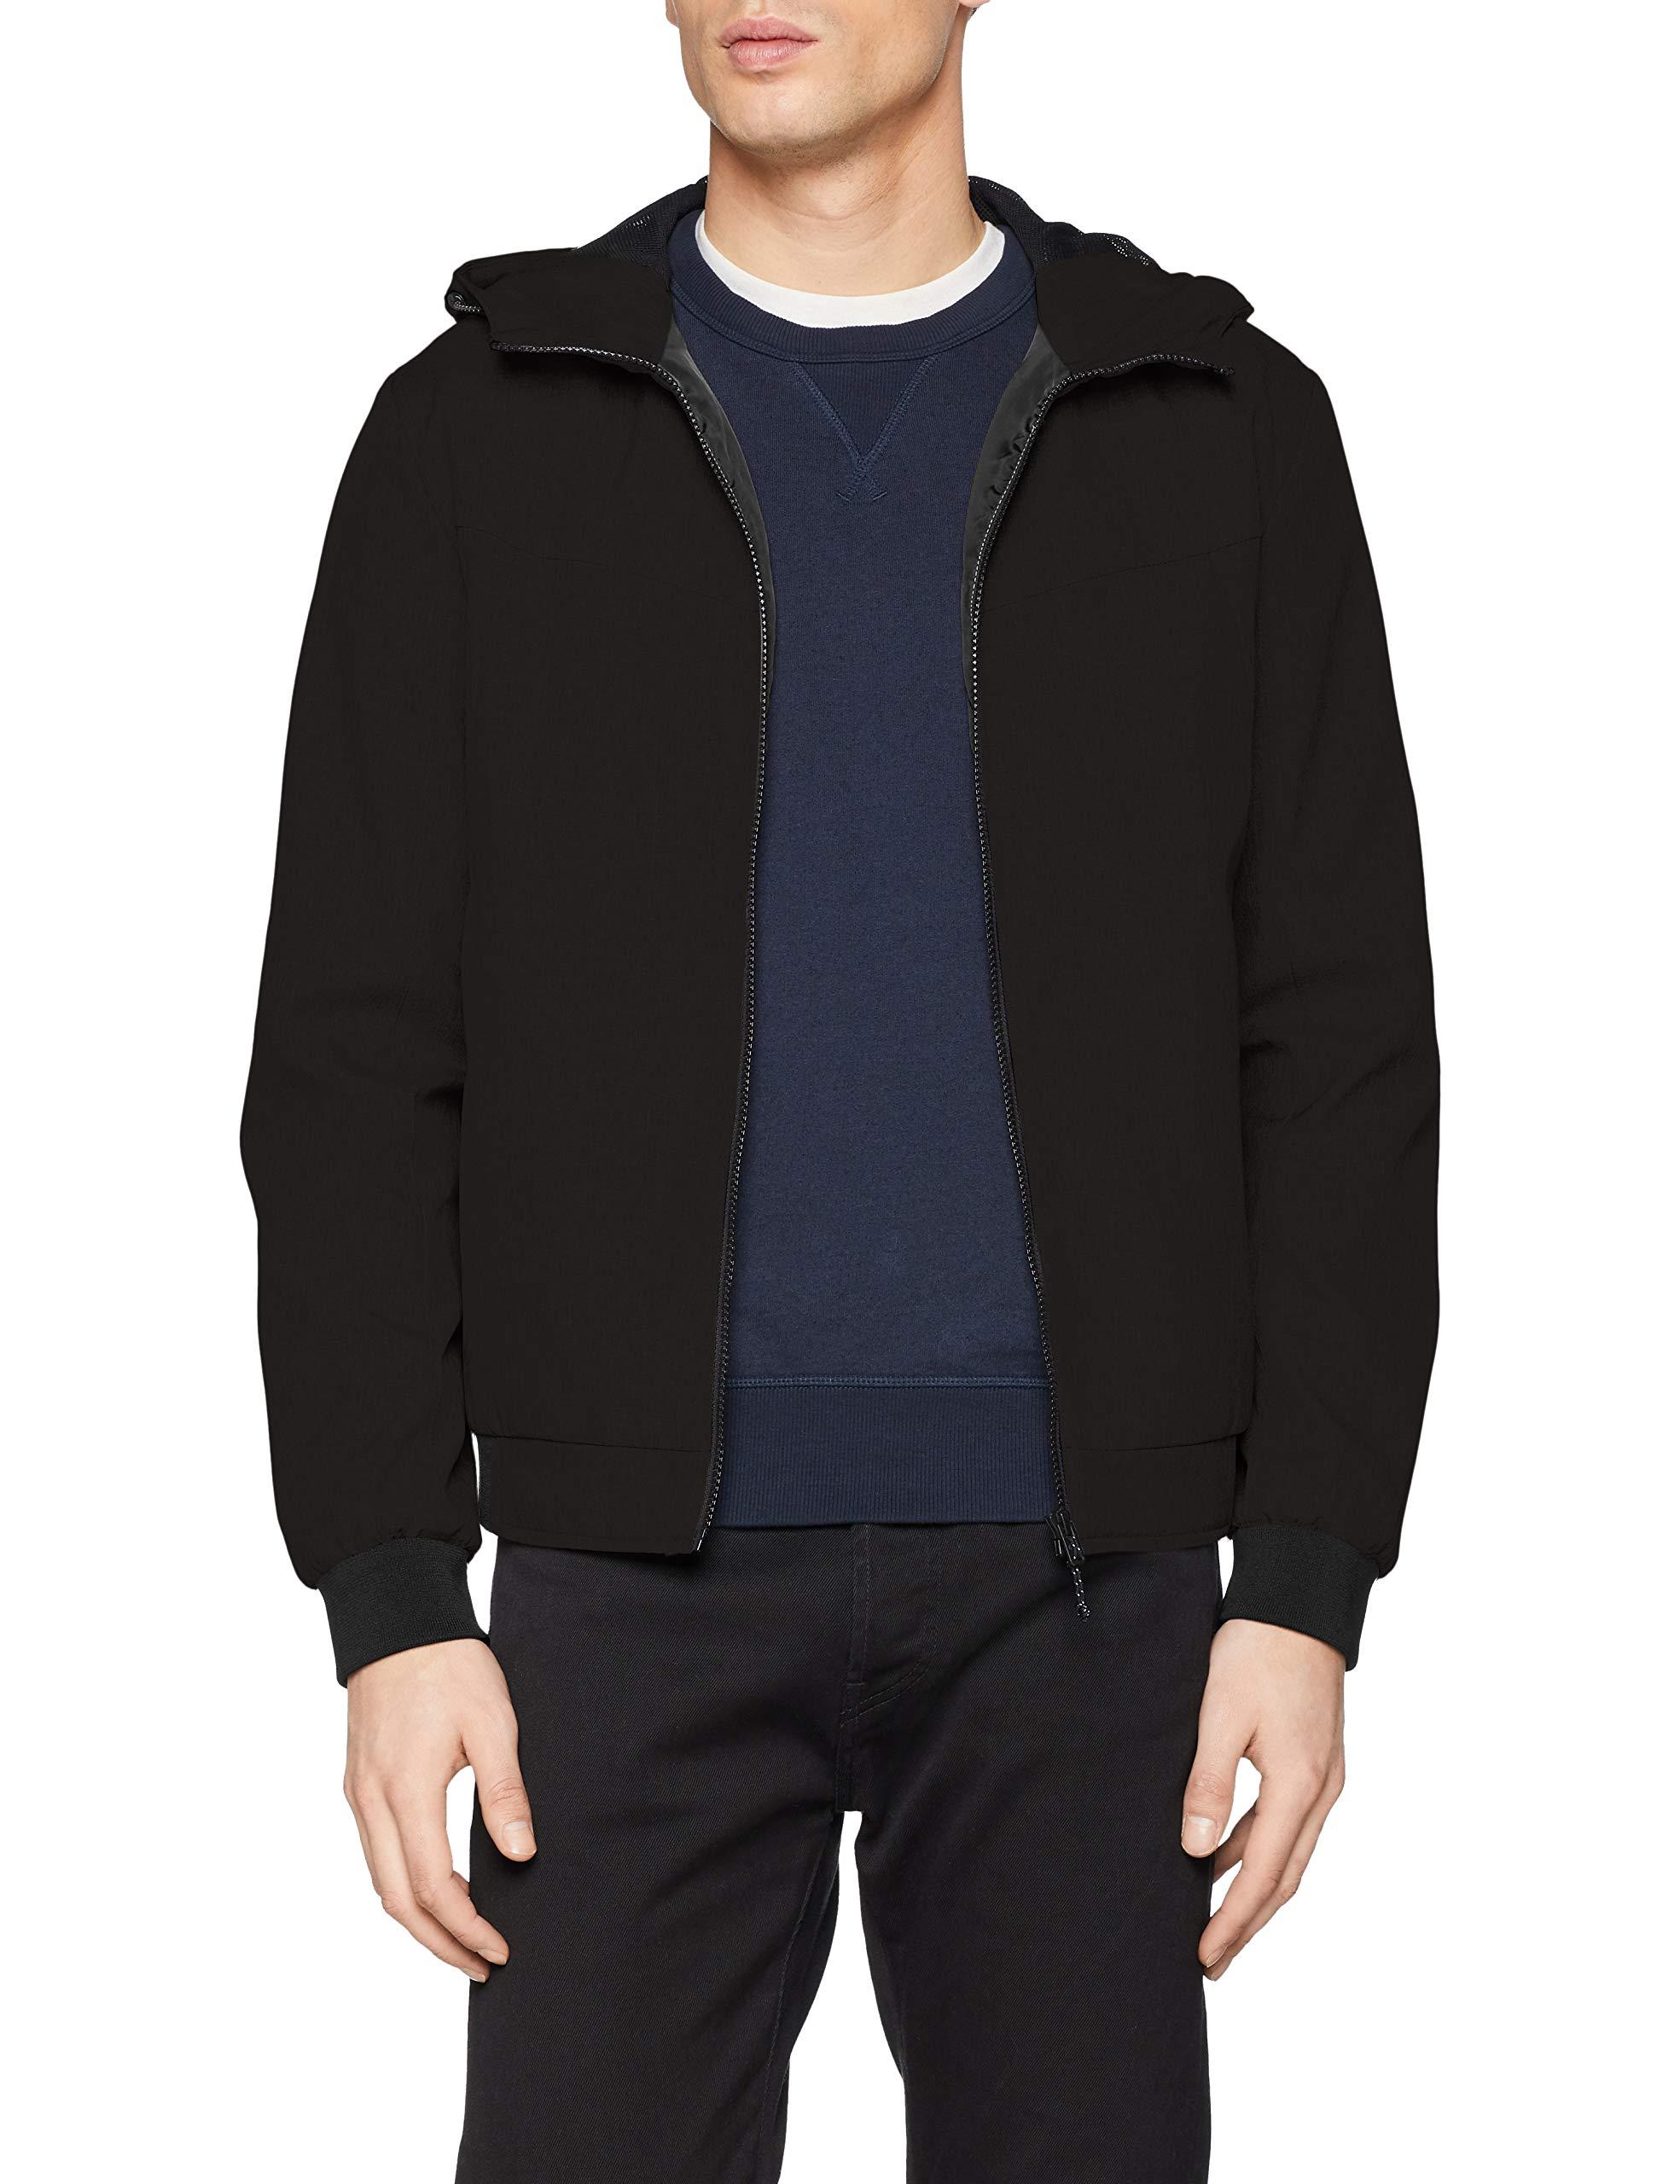 large Jackamp; Jcoalu Noos BlousonNoir Jones Jacket BlackXx Homme Rj54LA